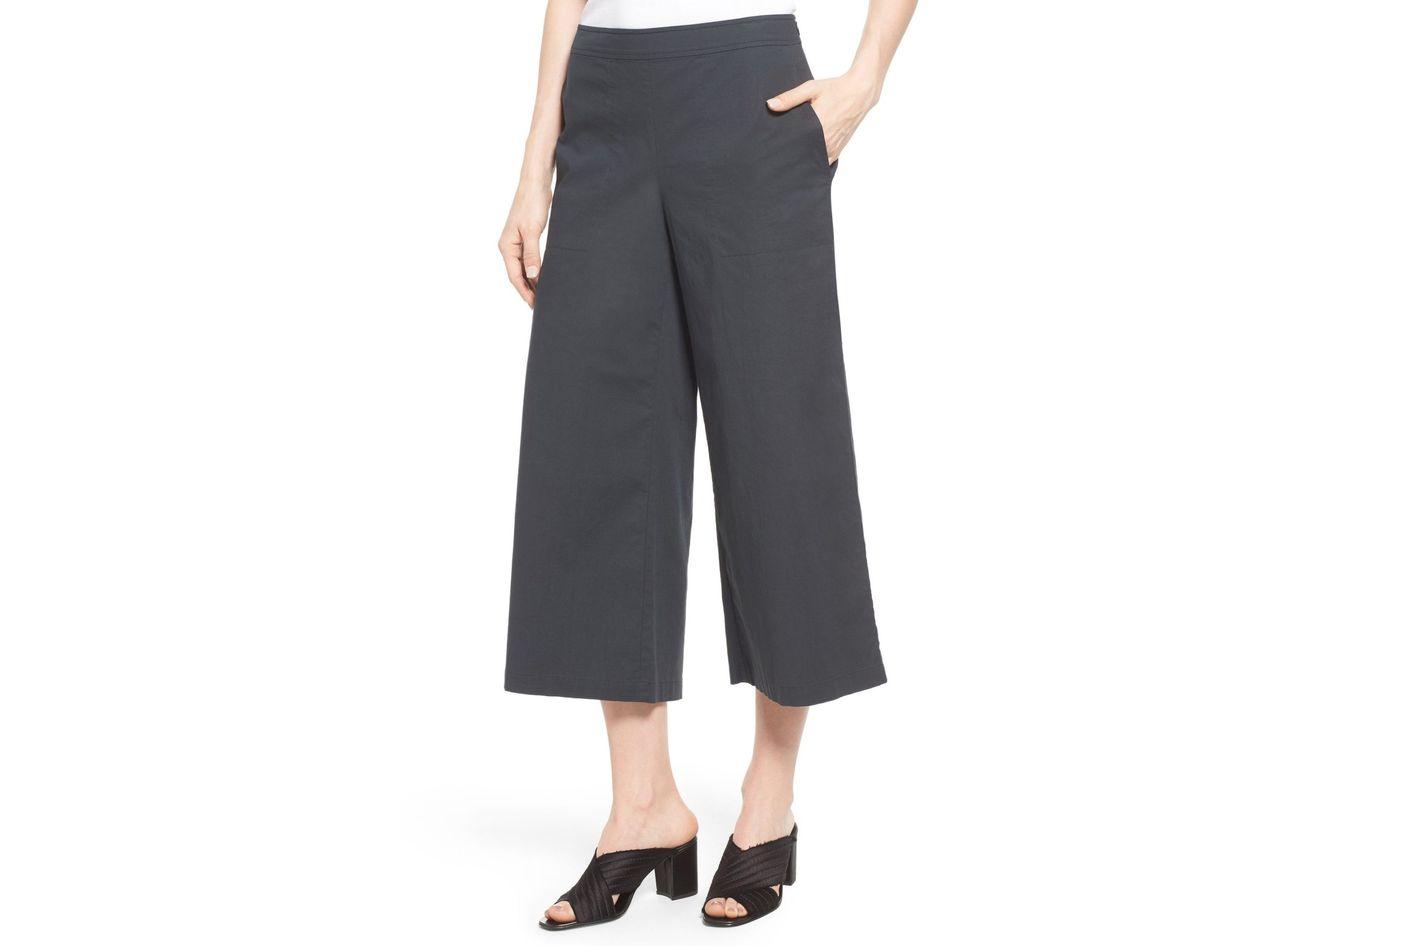 Eileen Fisher Stretch Organic Cotton Crop Wide Leg Pants